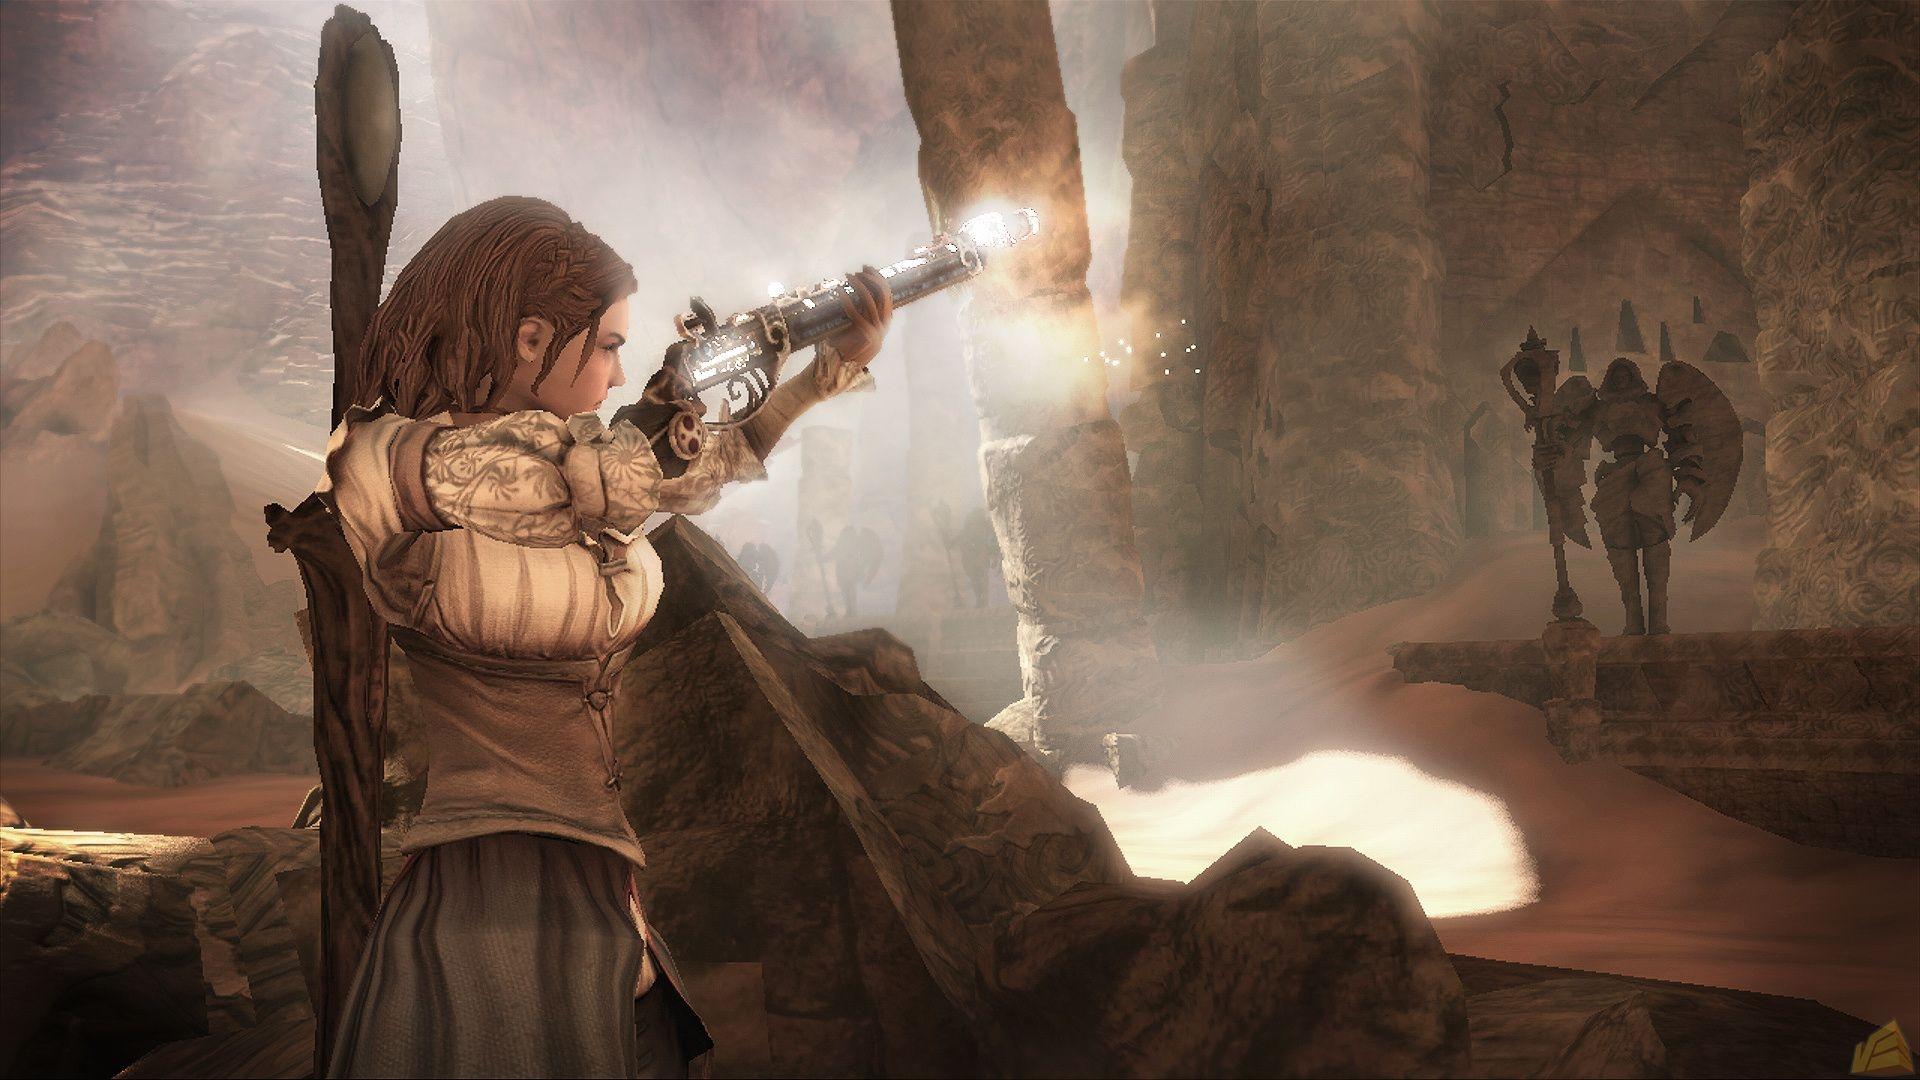 Скриншоты к игре Fable III.